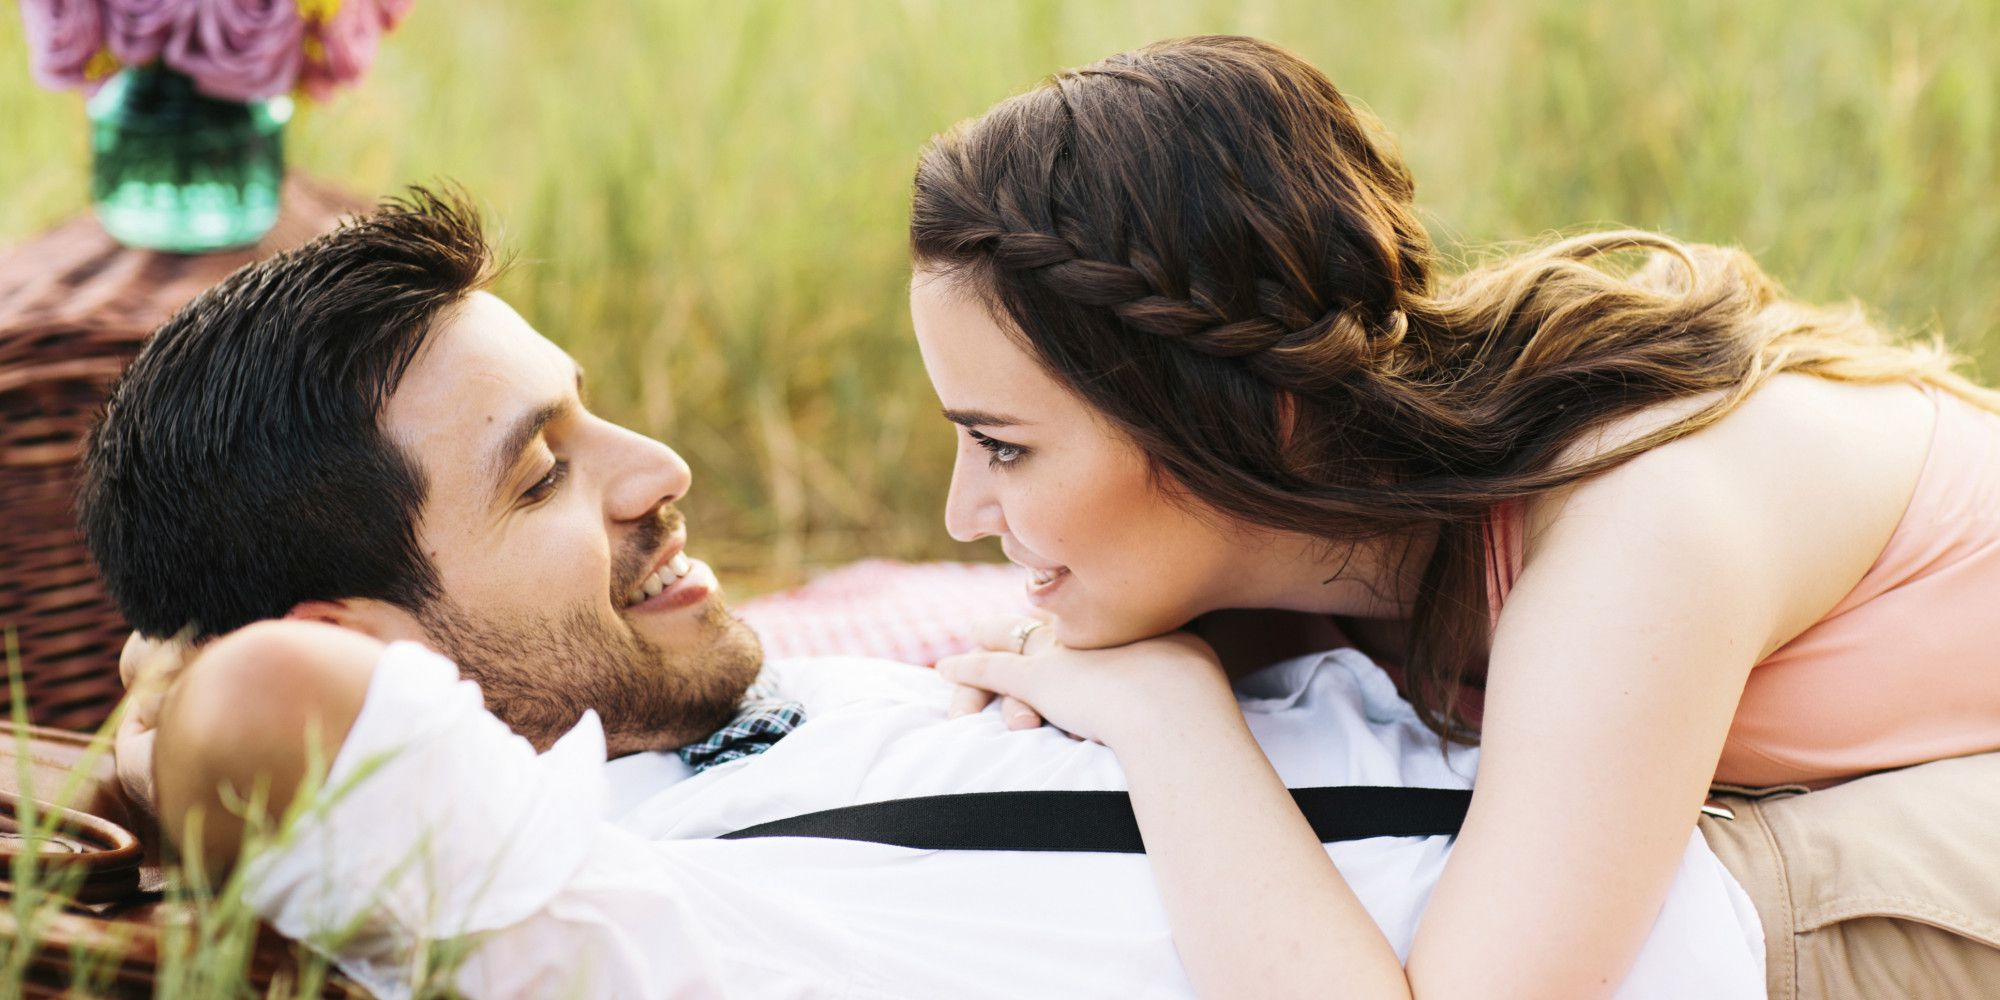 بالصور تحميل صور رومانسيه , رومنسيات جميله فى صورة 3876 4